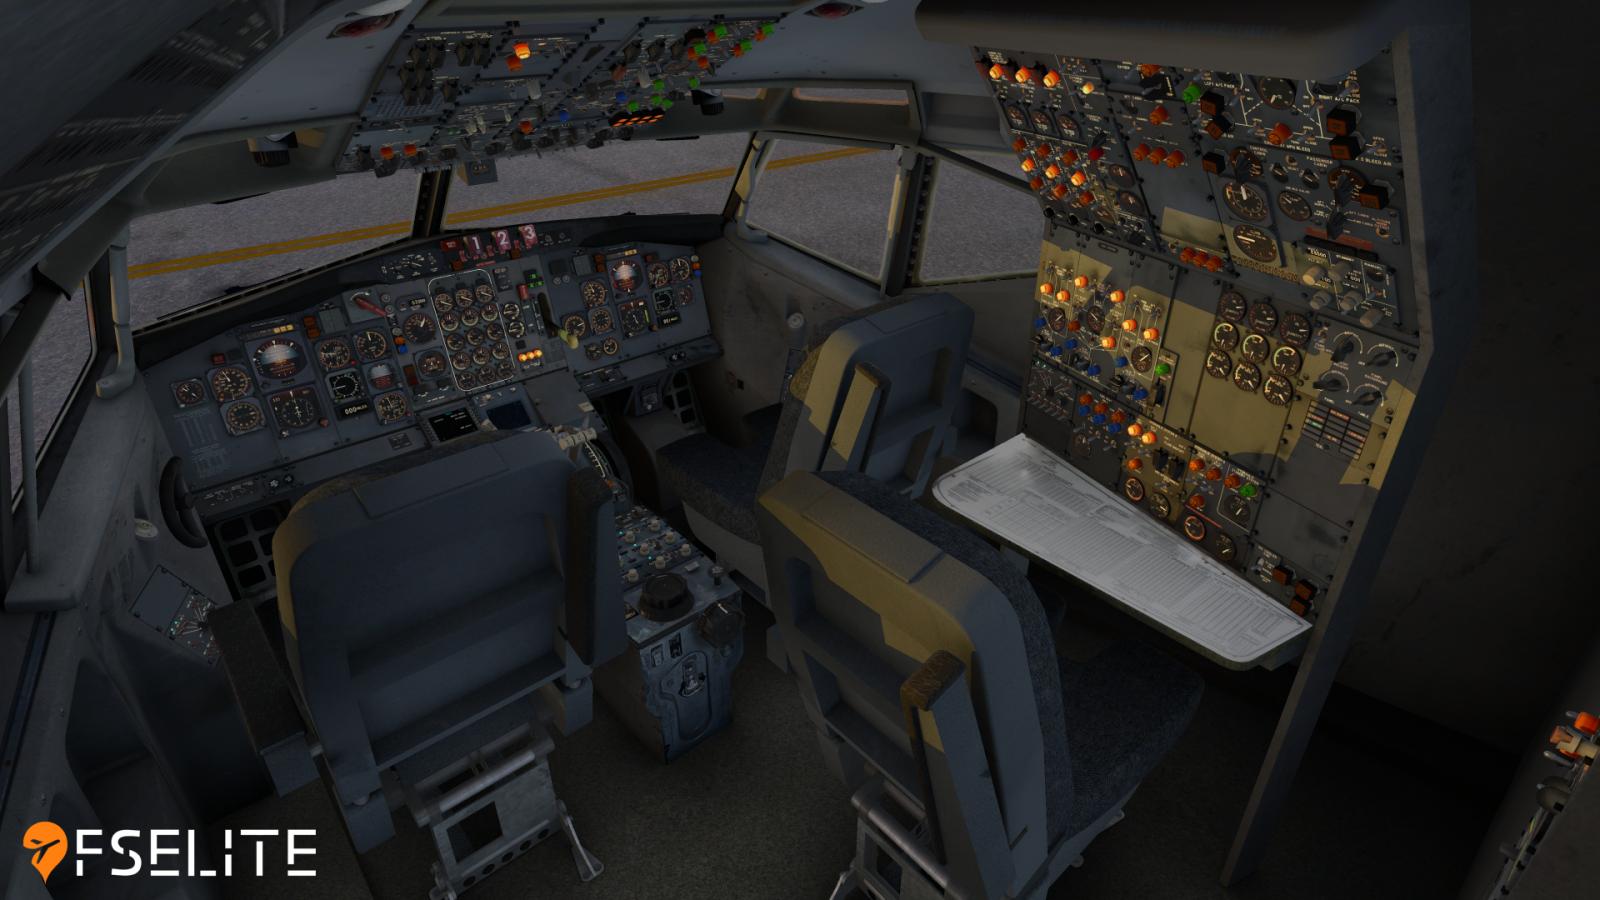 FlyJSim 727 Series Professional v3: The FSElite Review – FSElite